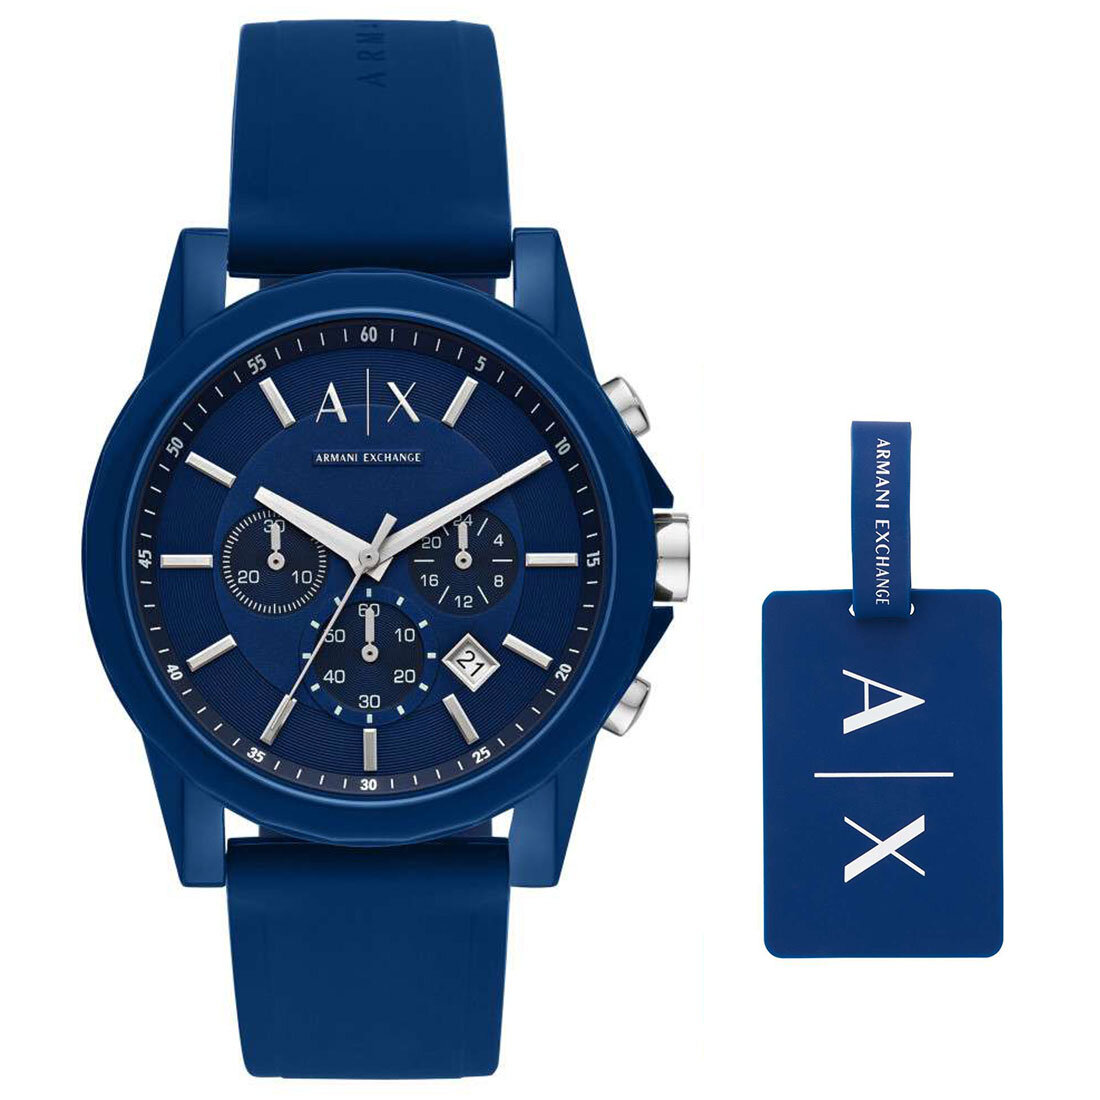 AX7107 Erkek Set Kol Saati ve Anahtarlık